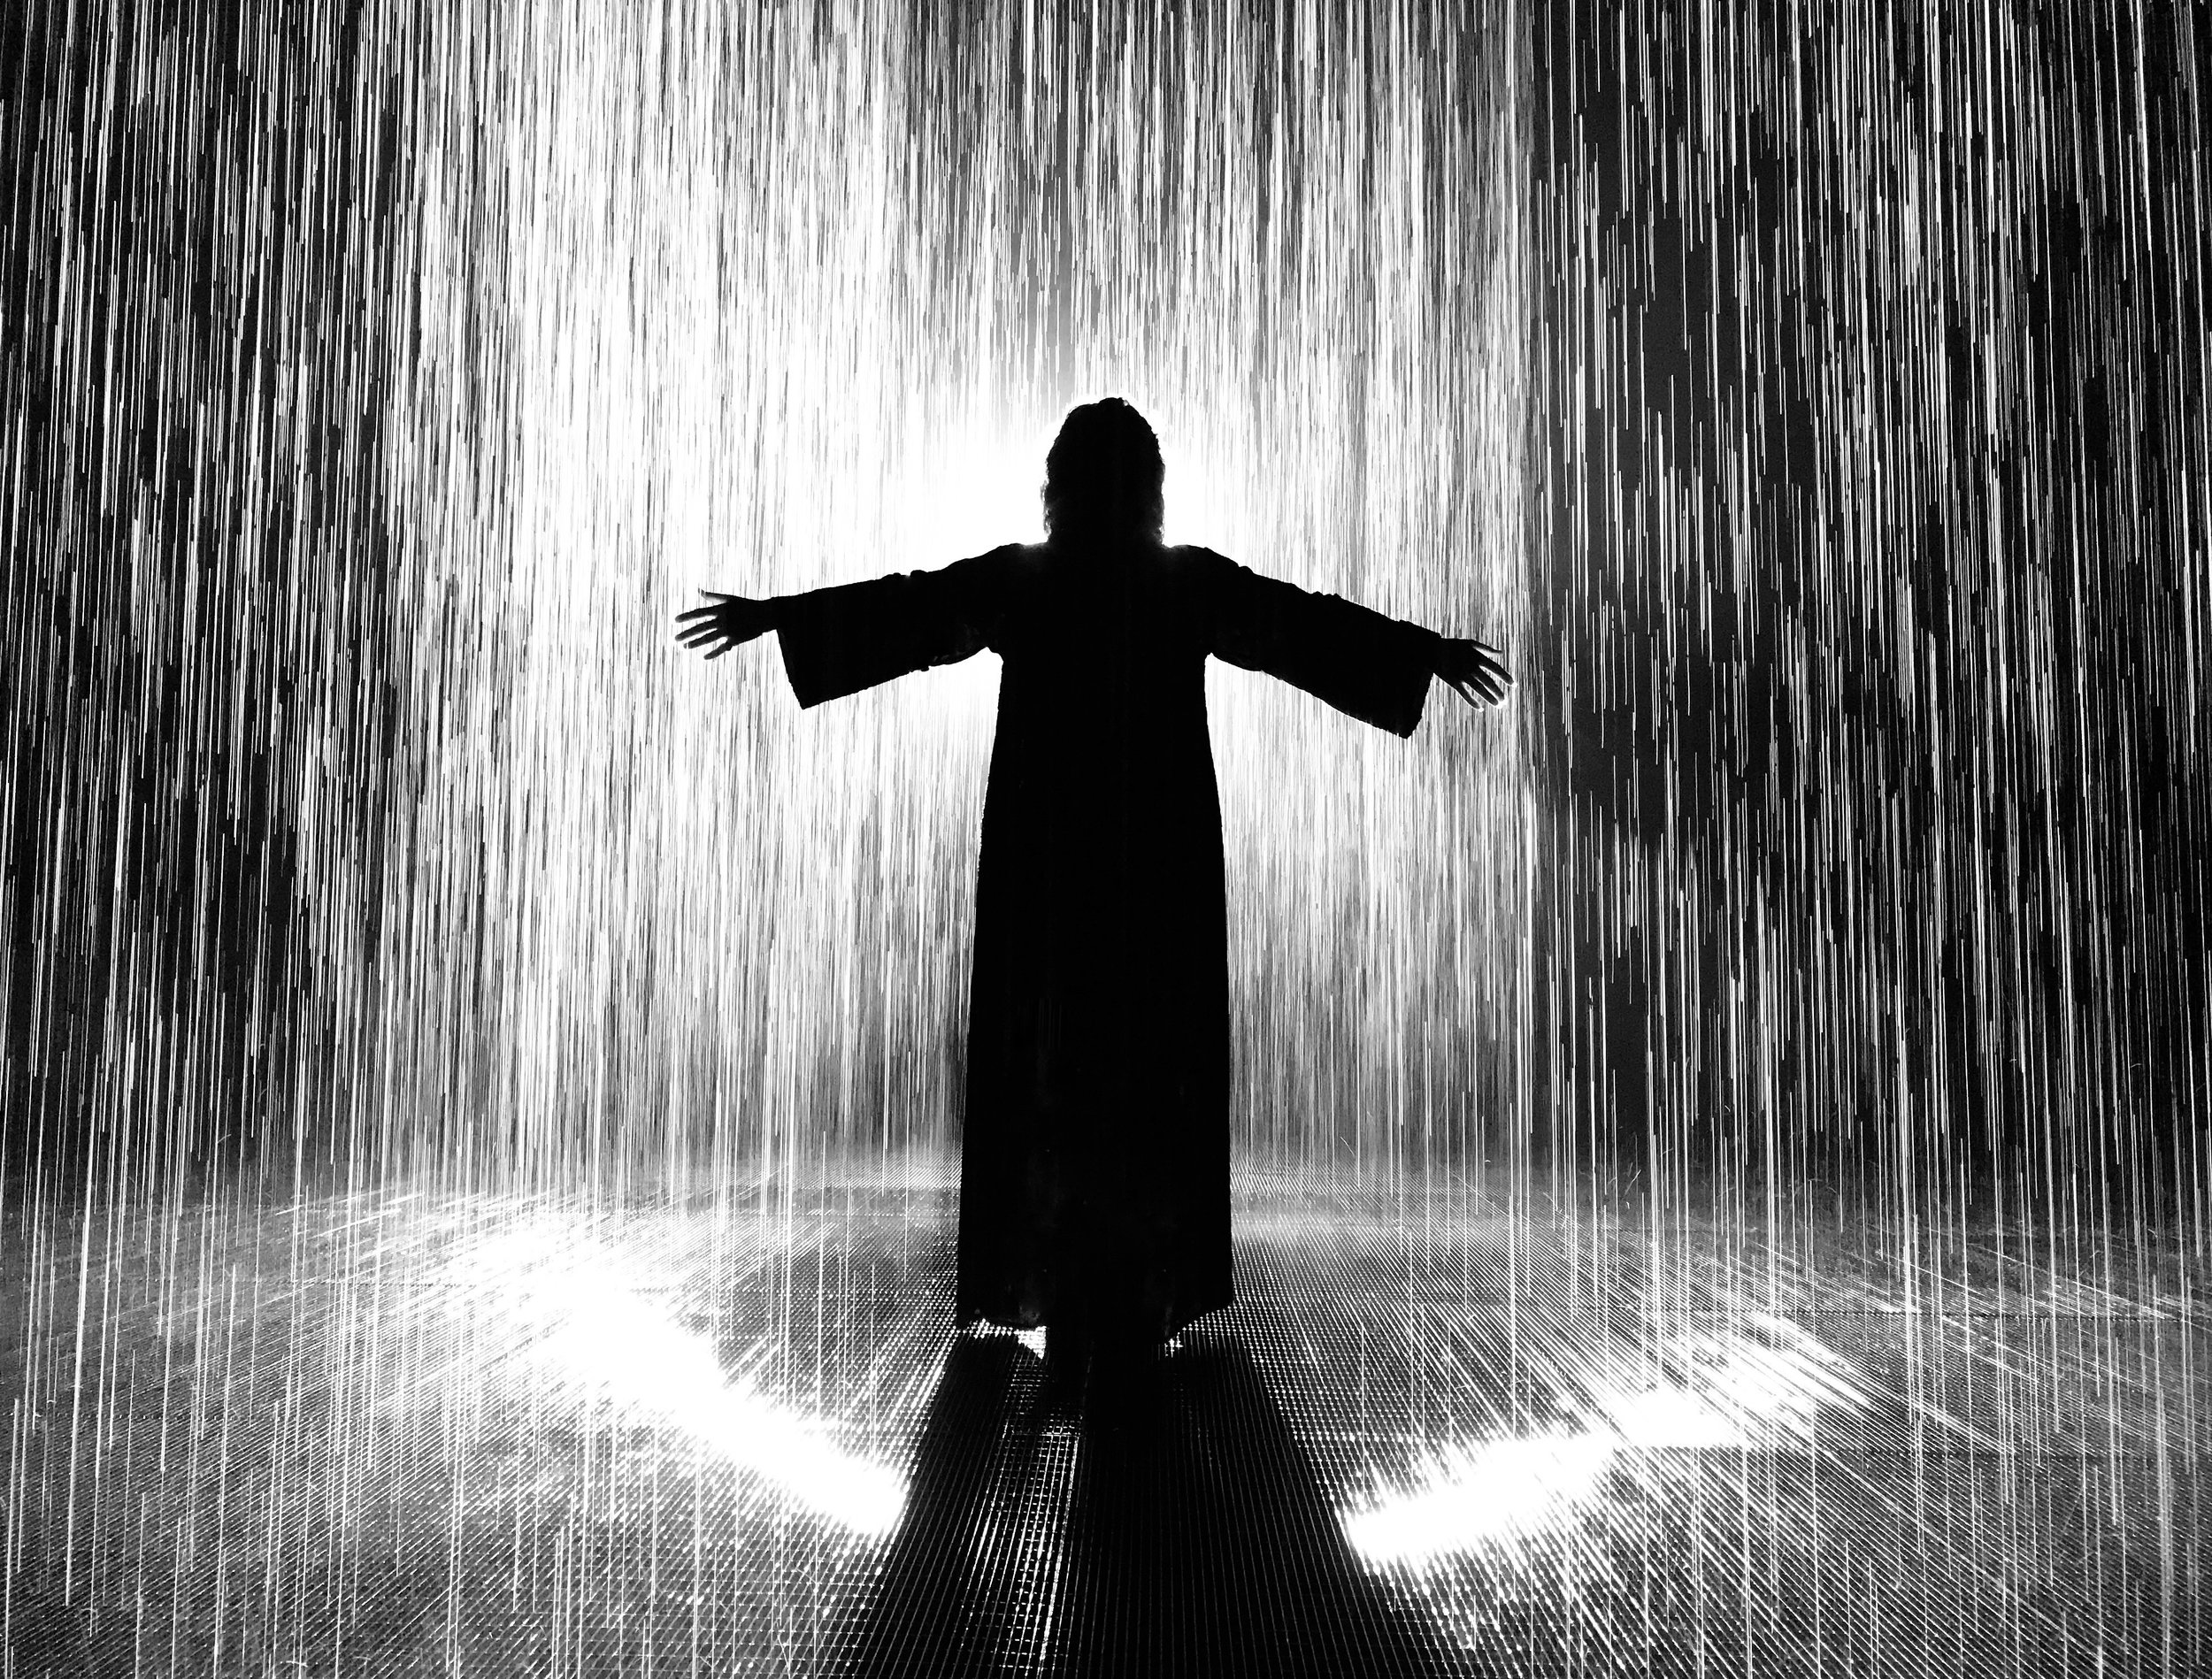 RAIN ROOM • SHARJAH, UAE PHOTOGRAPHER: WALEED